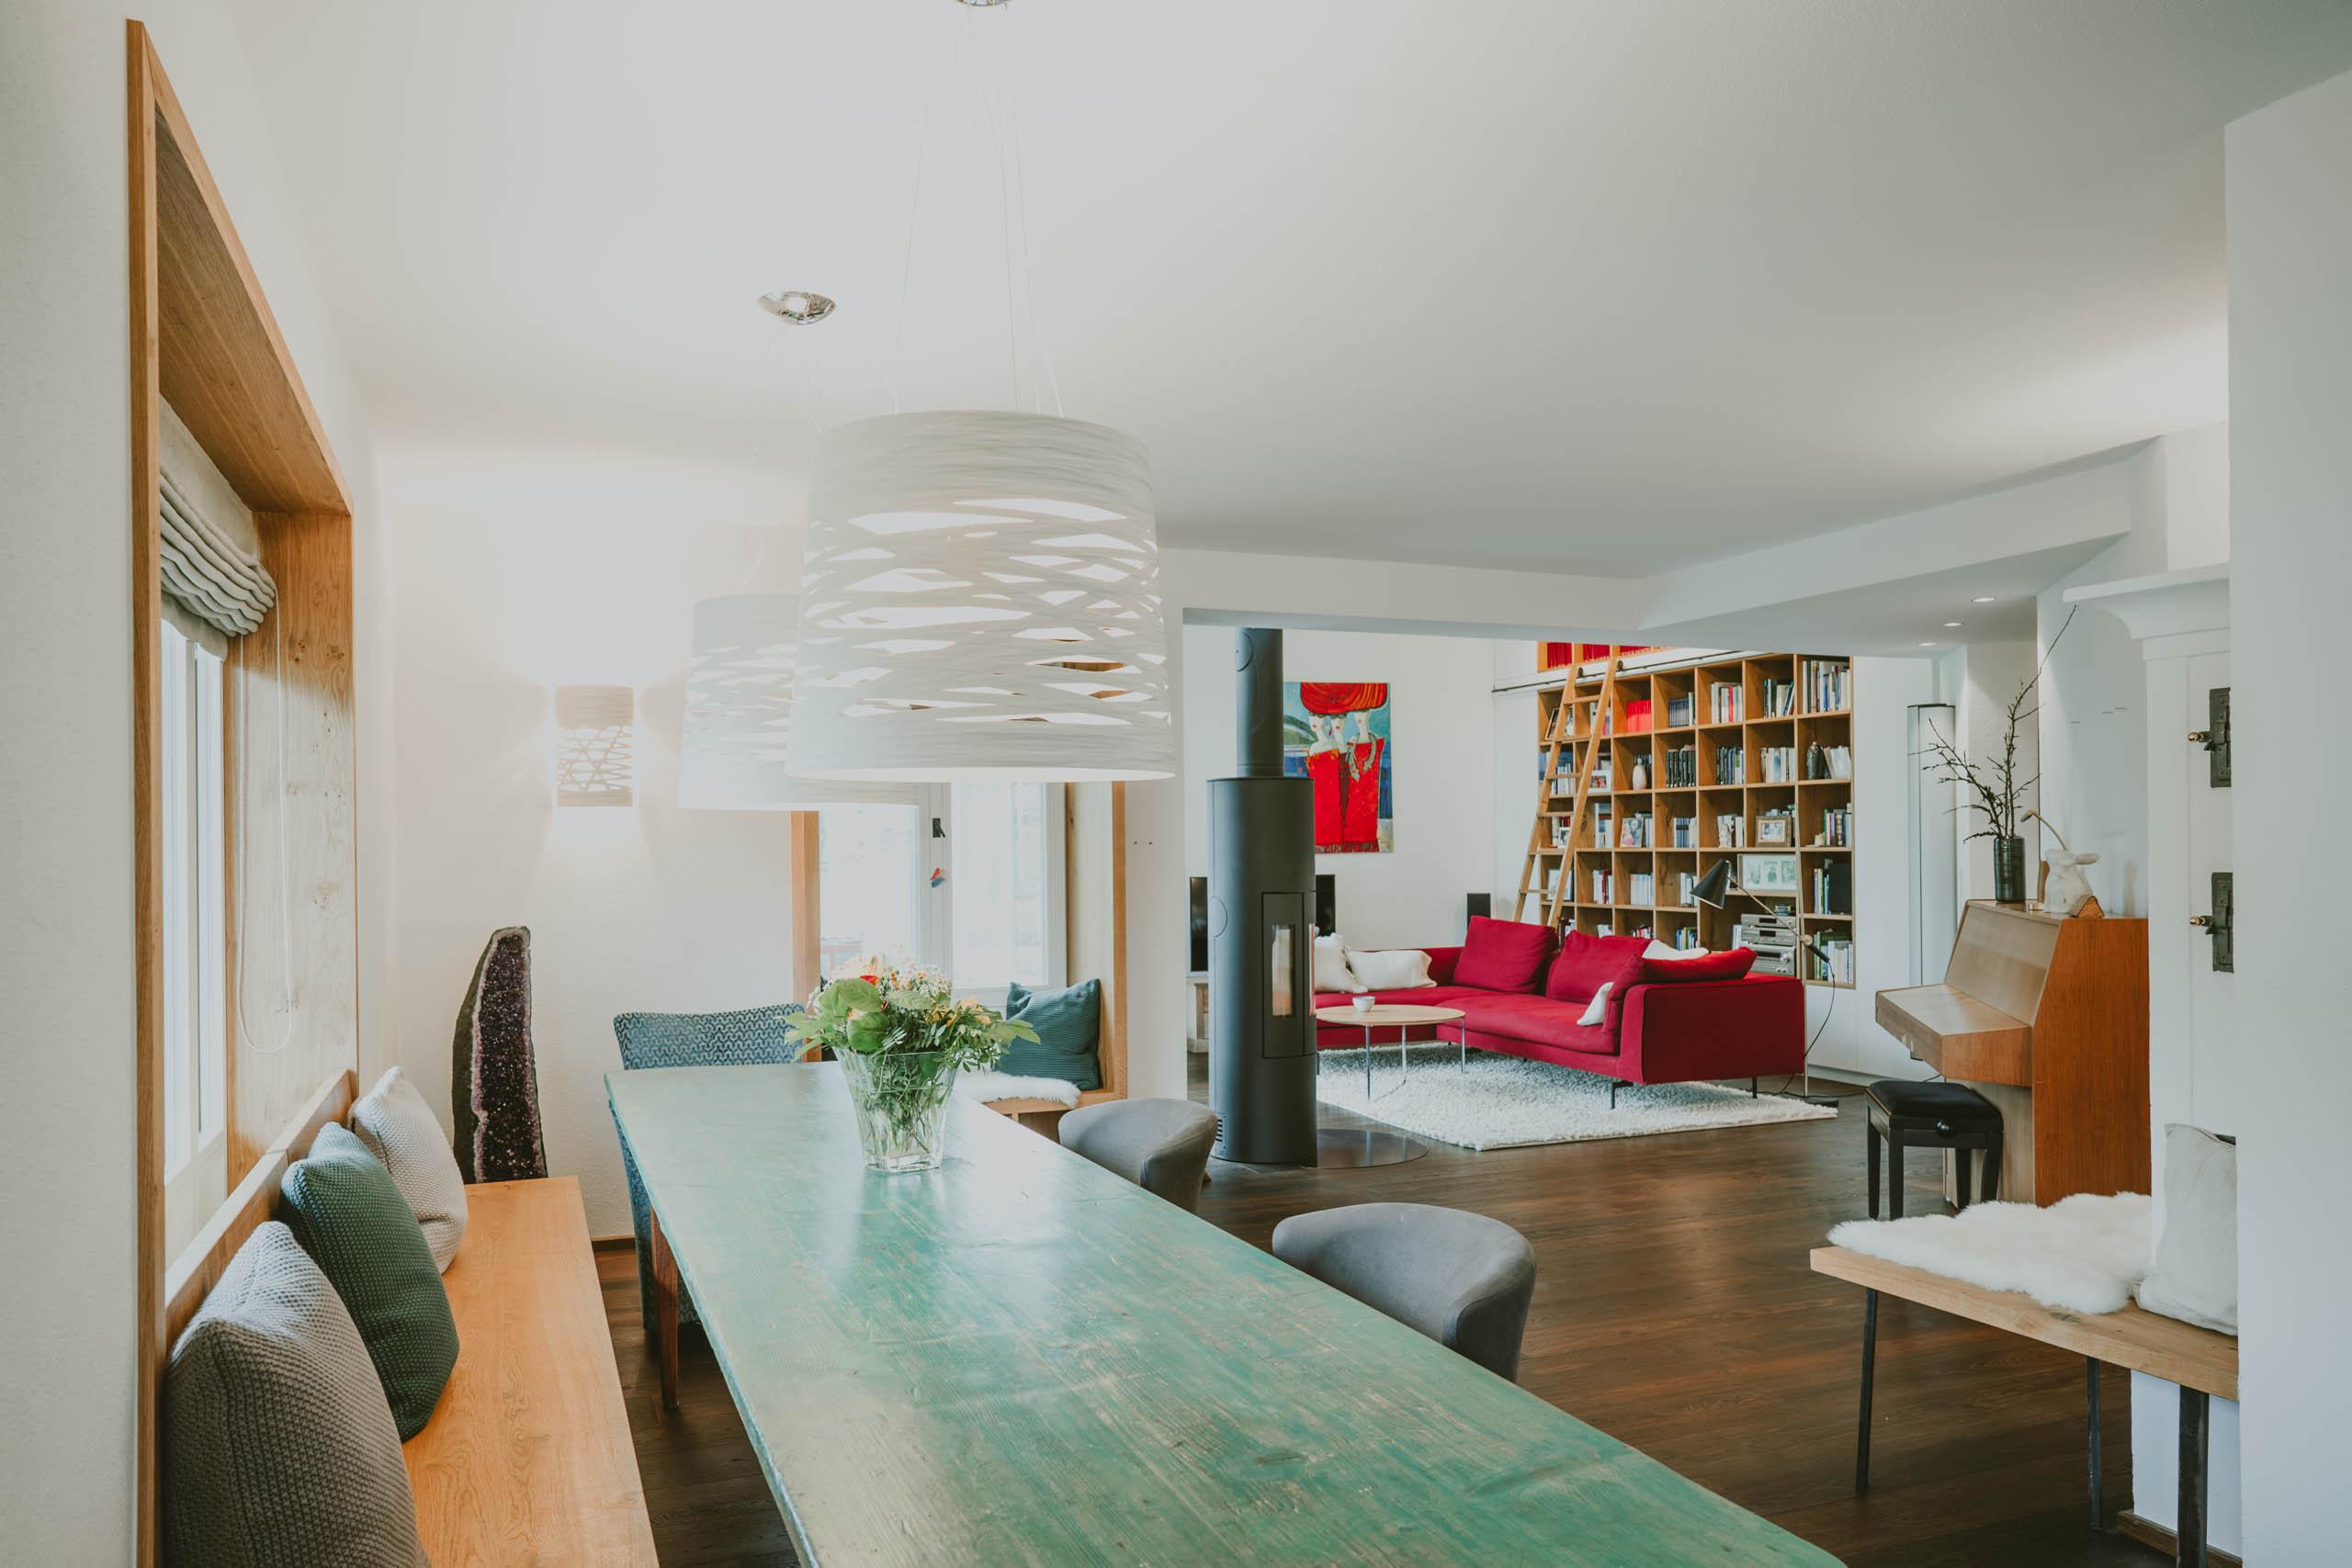 20210521 paula buchner innenarchitektur haus im chiemgau by andreamittermeier 9AM06350